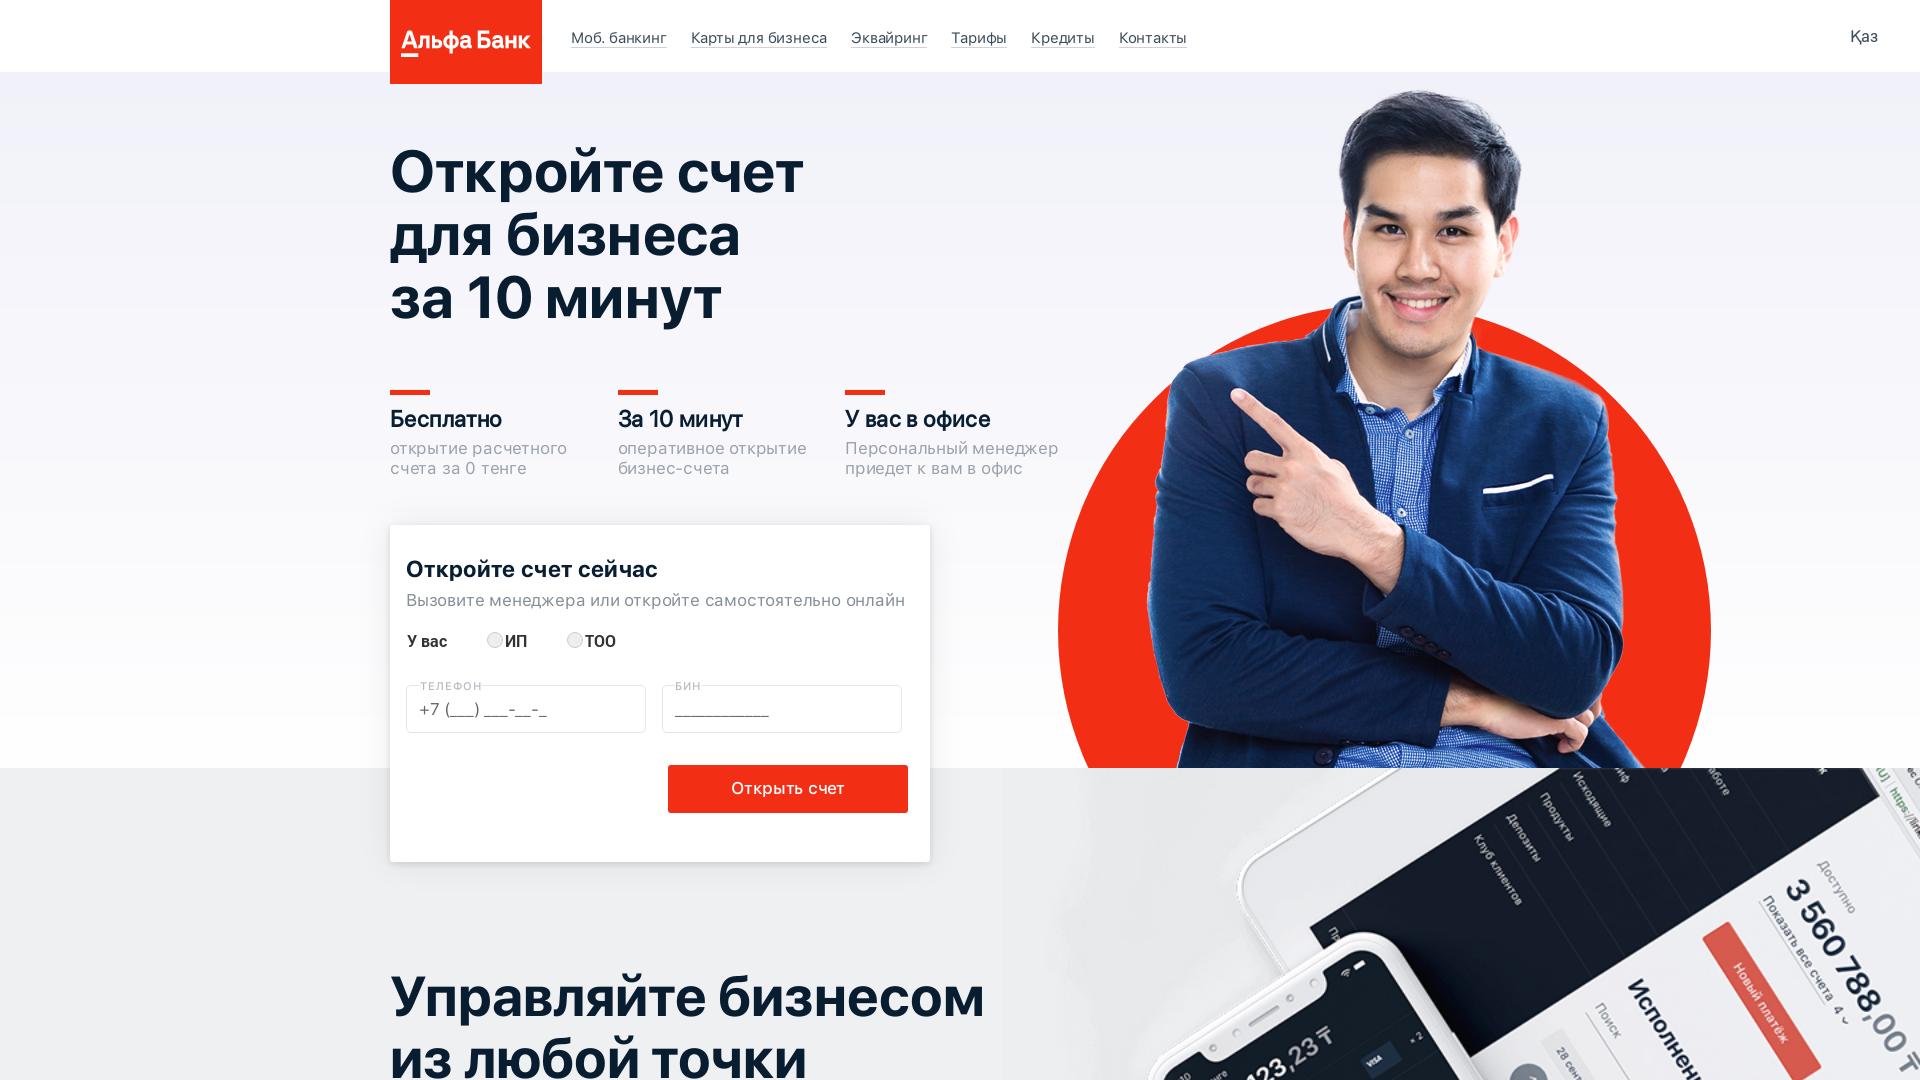 Альфа-Банк (CPL) KZ website